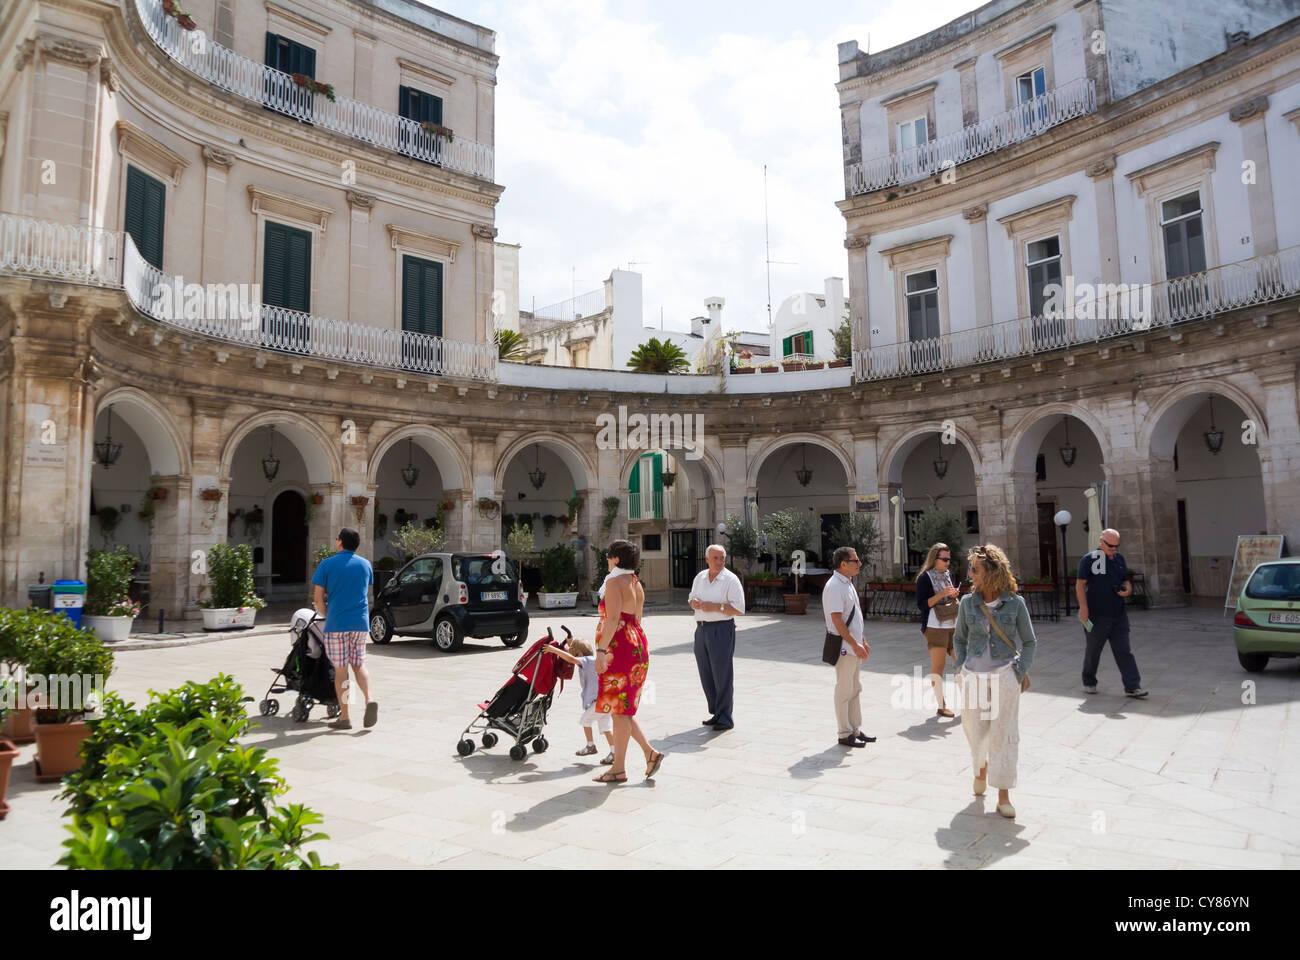 Martina Franca Puglia Italie Plaza avec les habitants Photo Stock